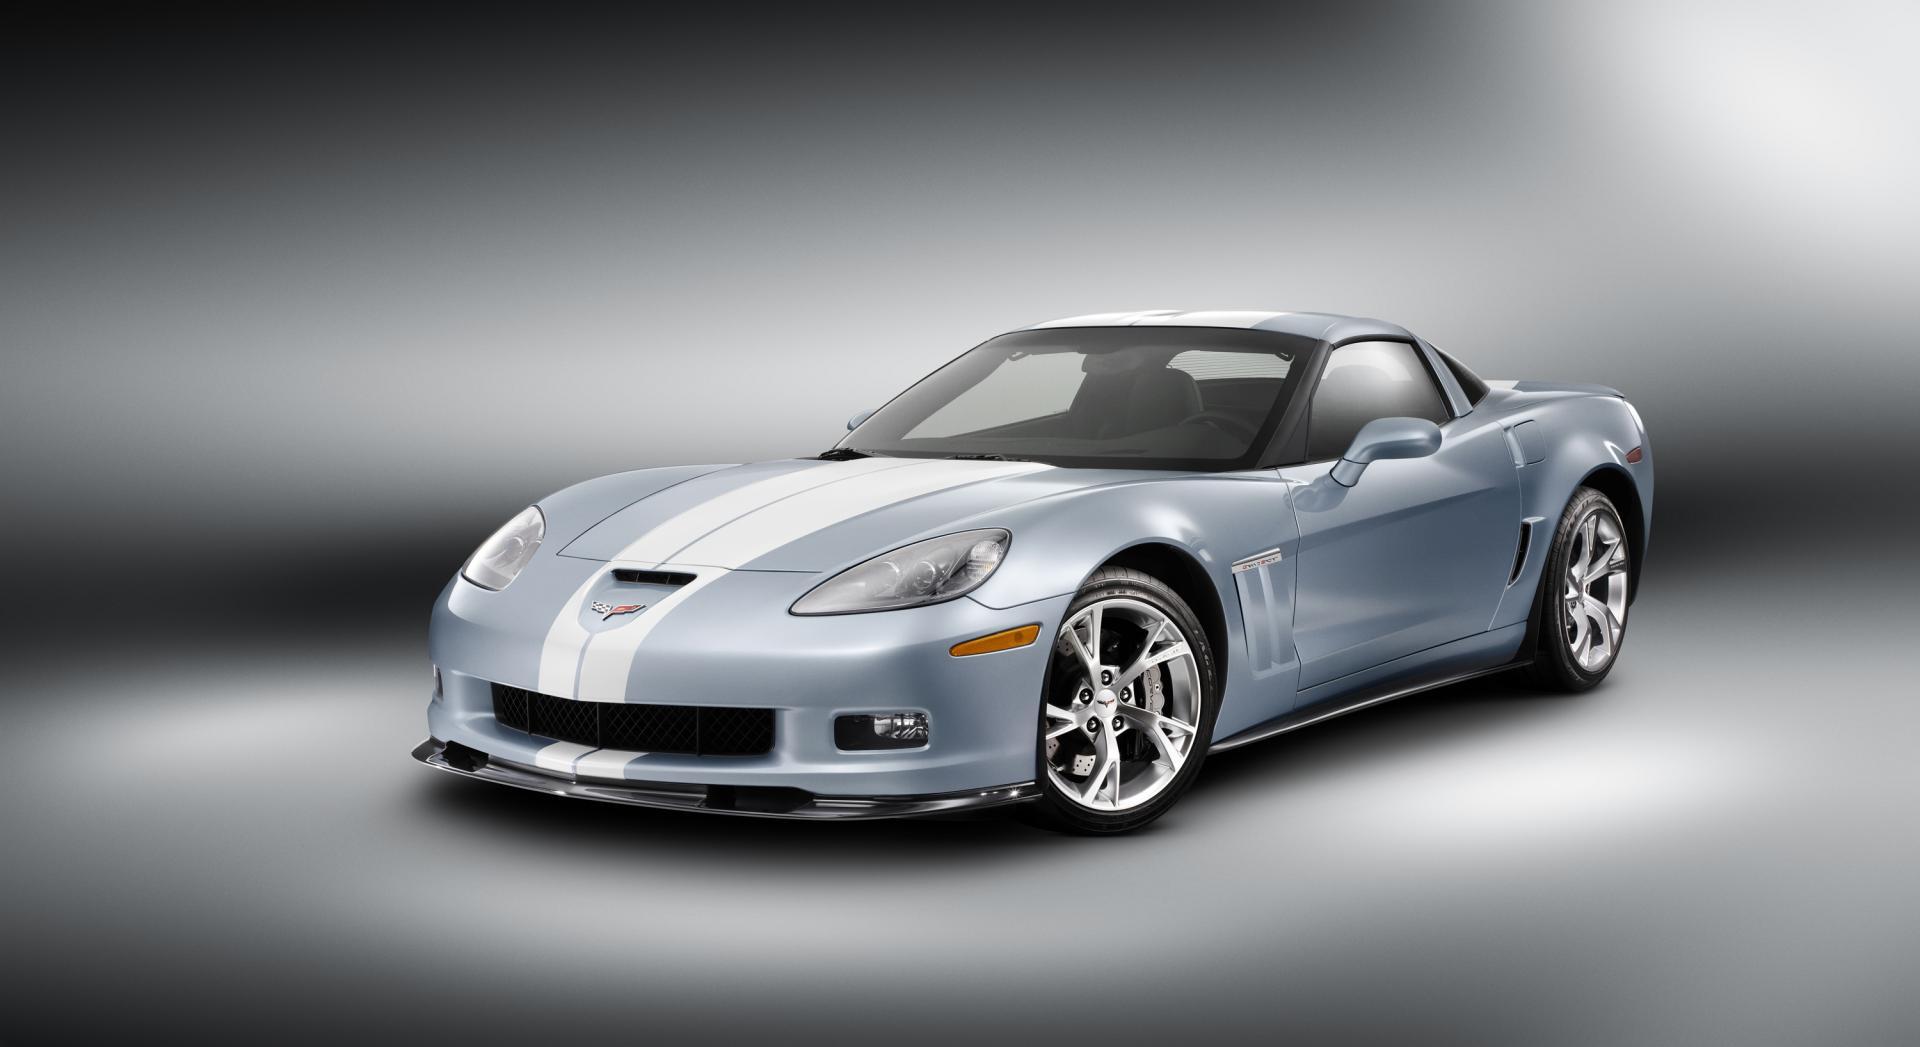 2012 chevrolet corvette carlisle blue grand sport concept. Black Bedroom Furniture Sets. Home Design Ideas